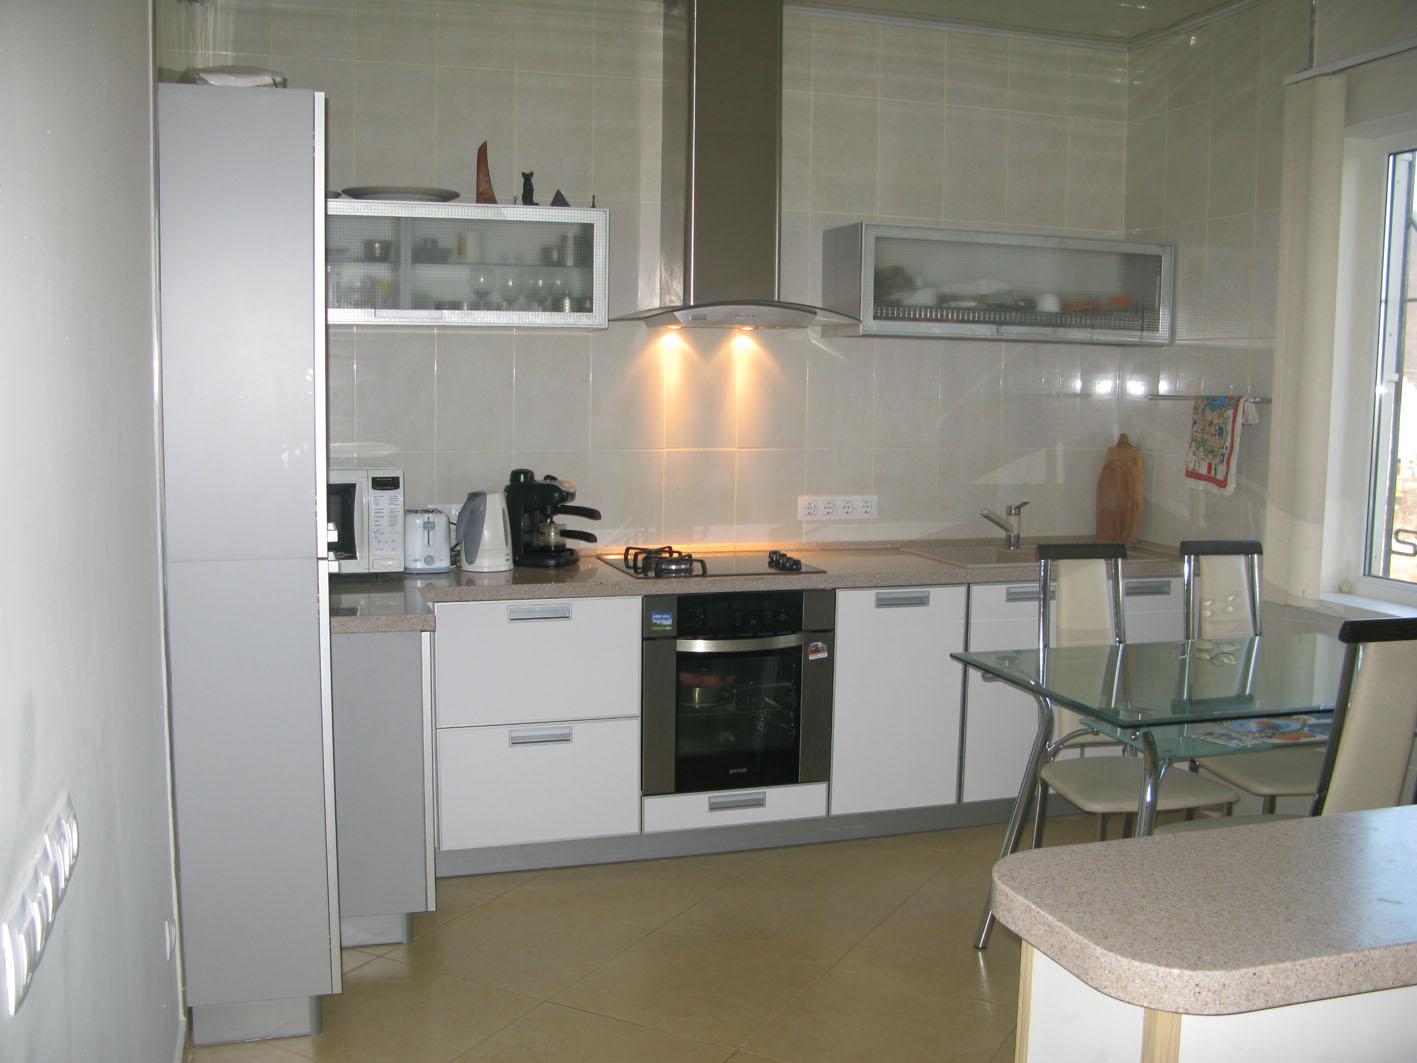 Интерьер кухни своими руками недорого фото 24